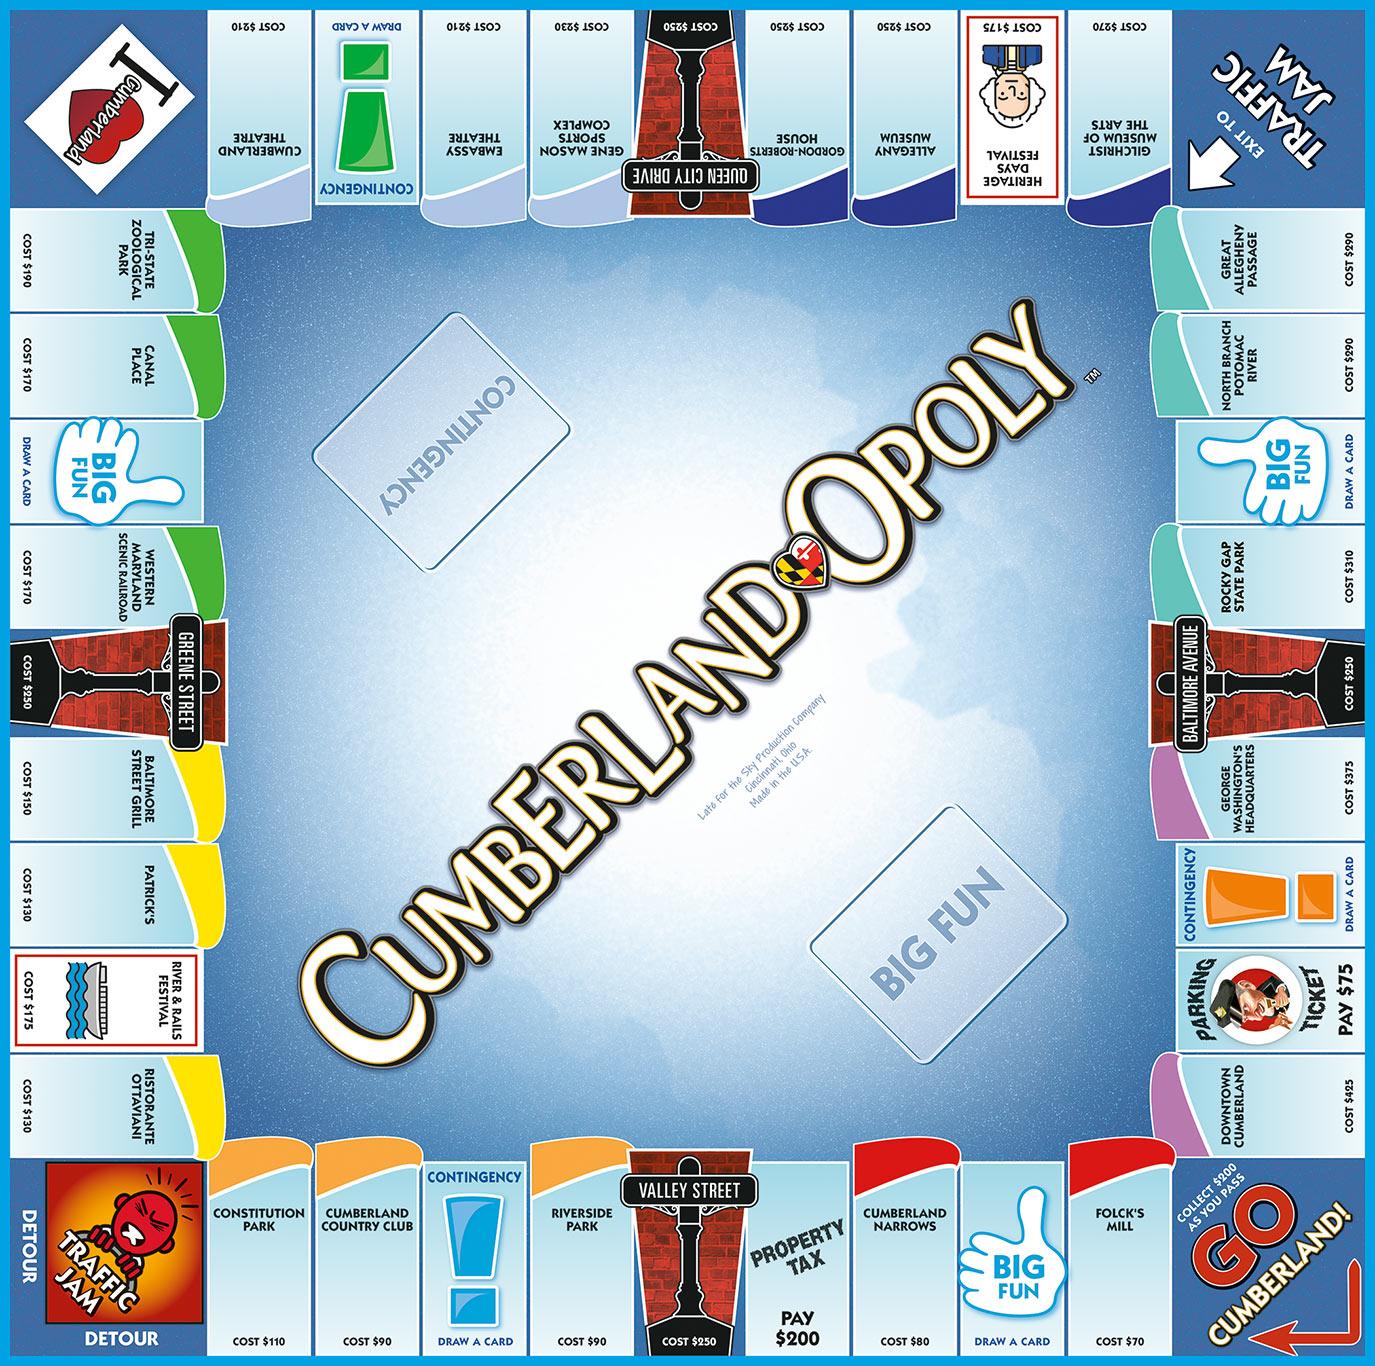 CUMBERLAND-OPOLY Board Game